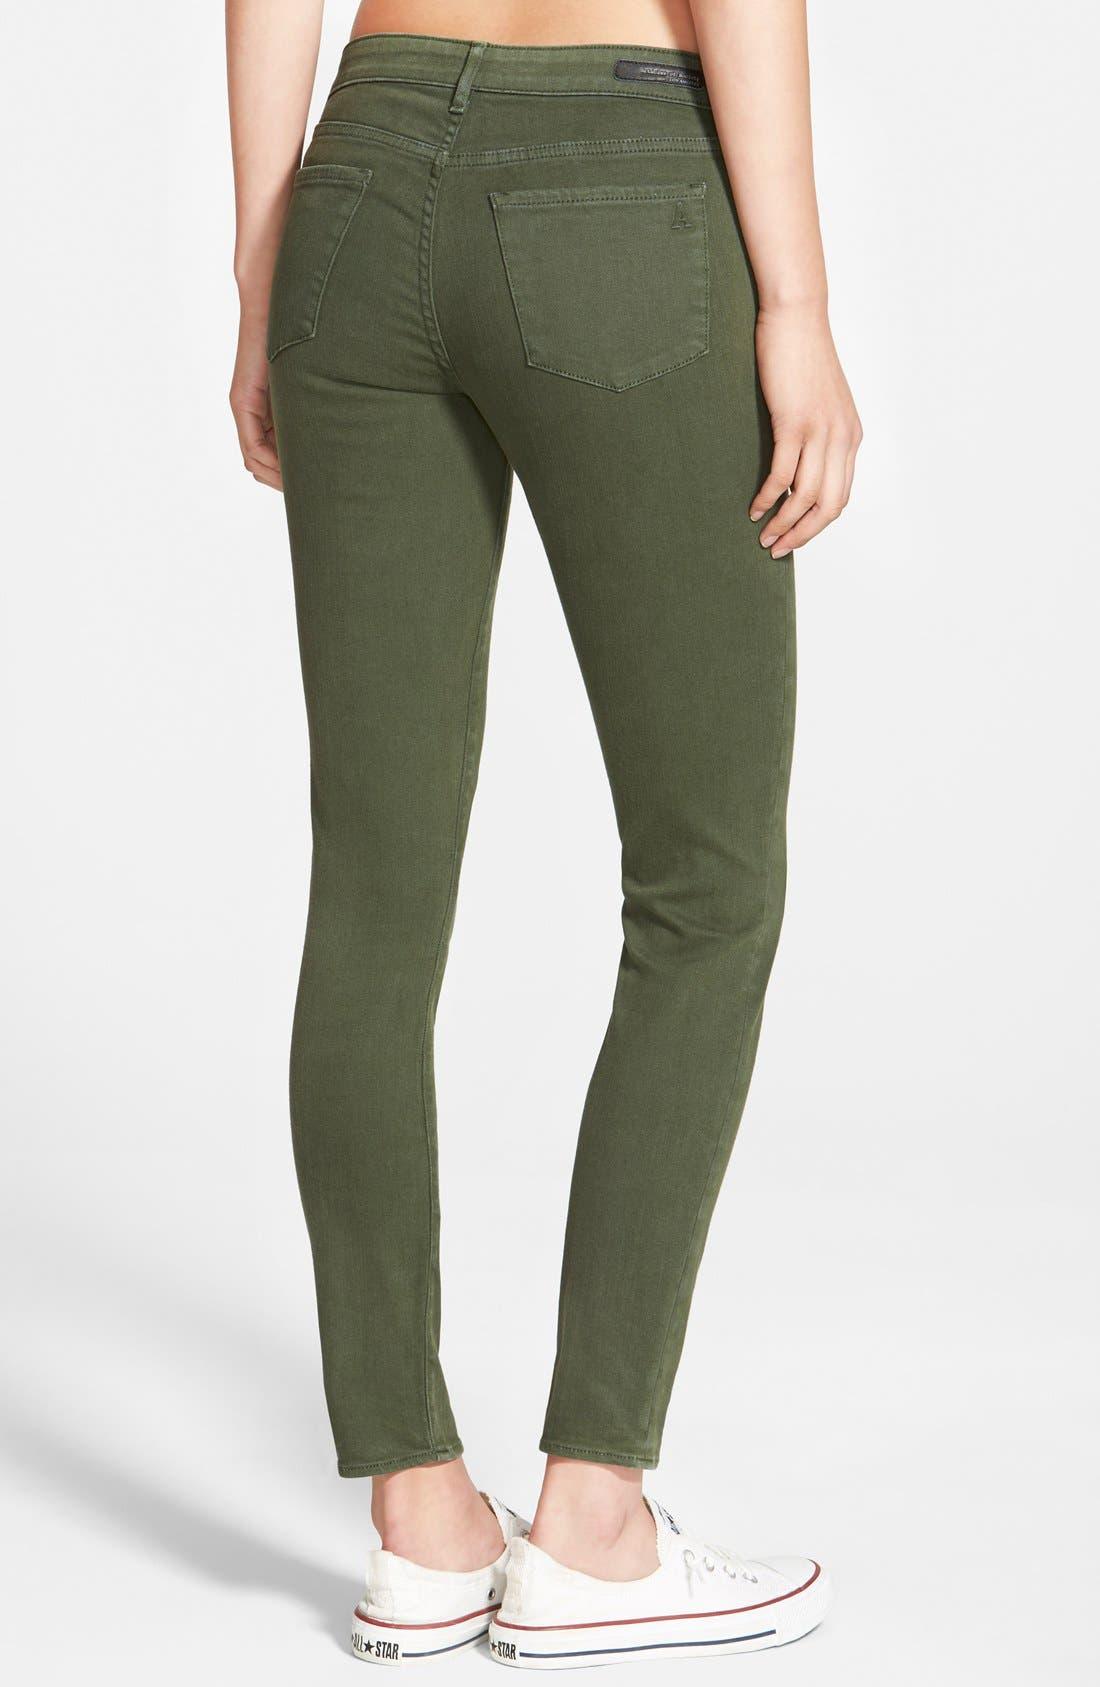 Alternate Image 2  - Articles of Society 'Cindy' Overdye Skinny Jeans (Olive)